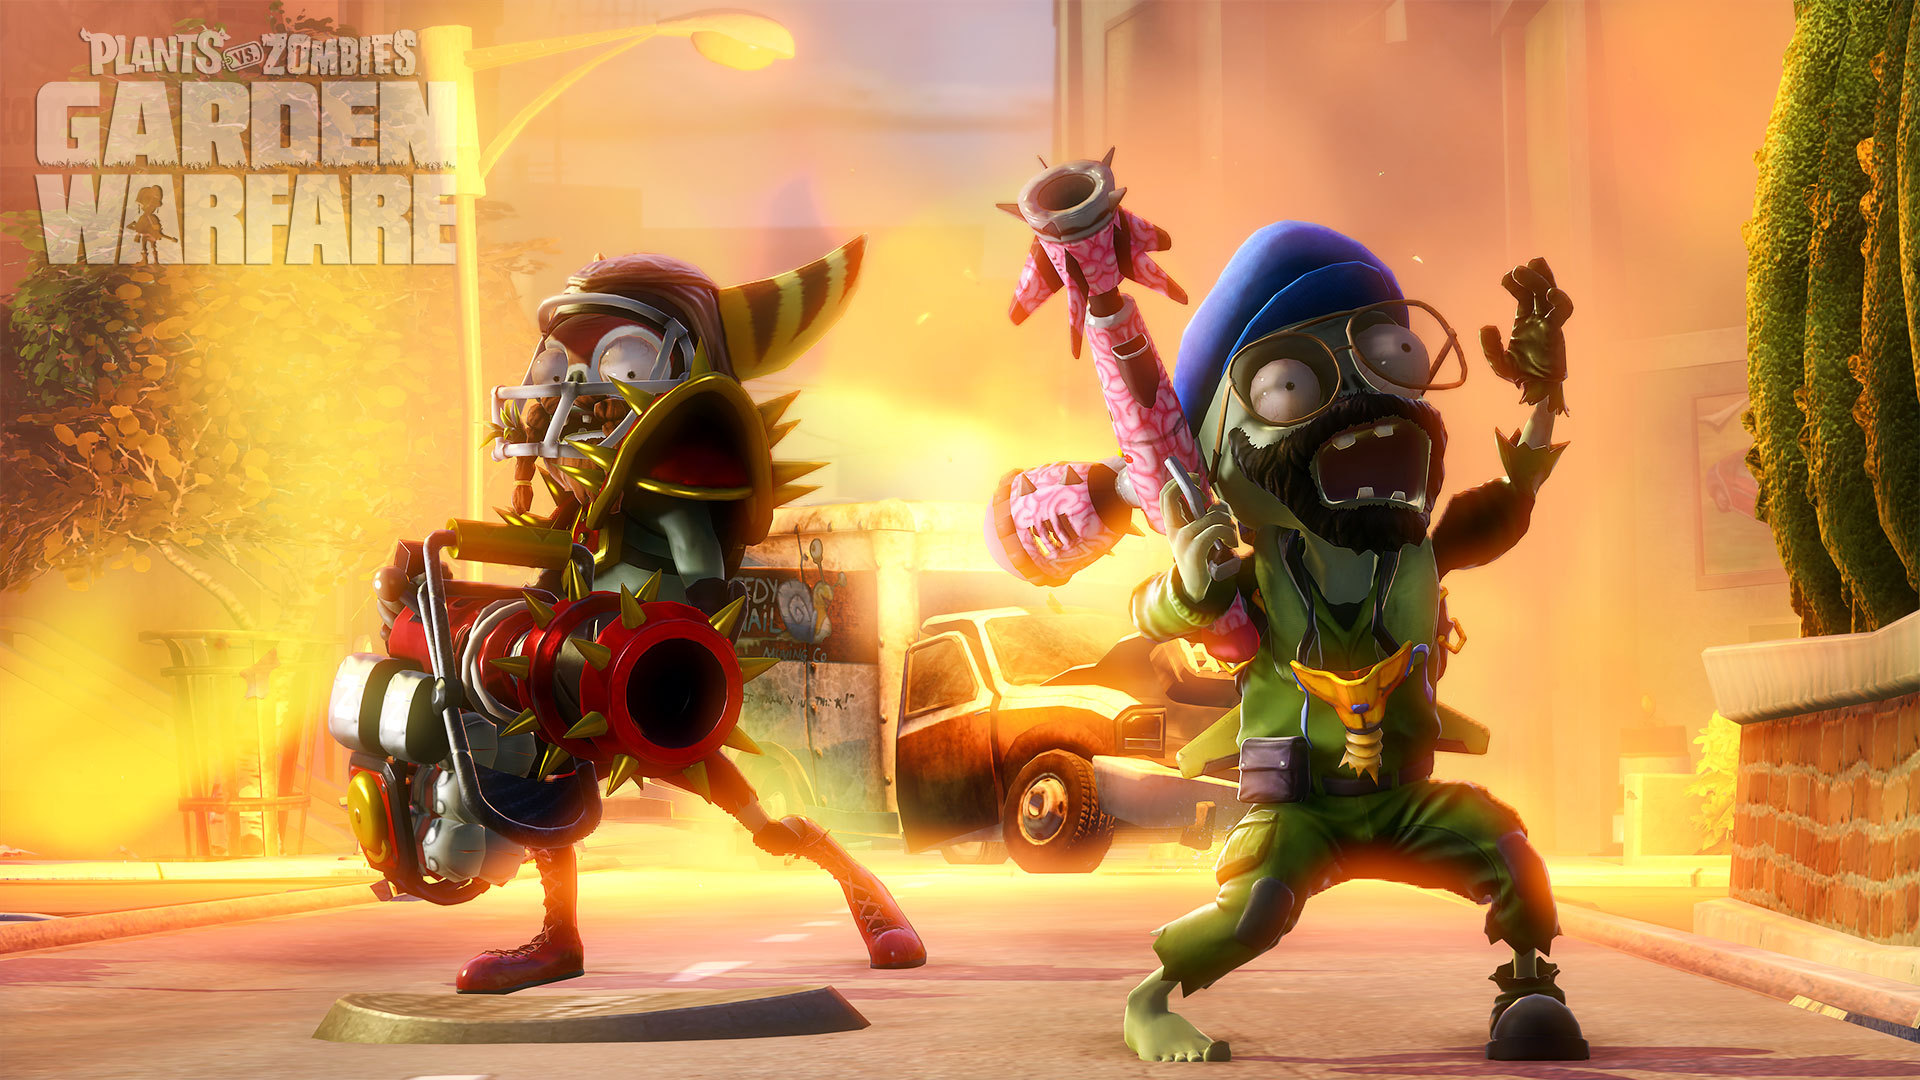 Peashooter (Plants vs. Zombies: Garden Warfare) | Plants vs ...